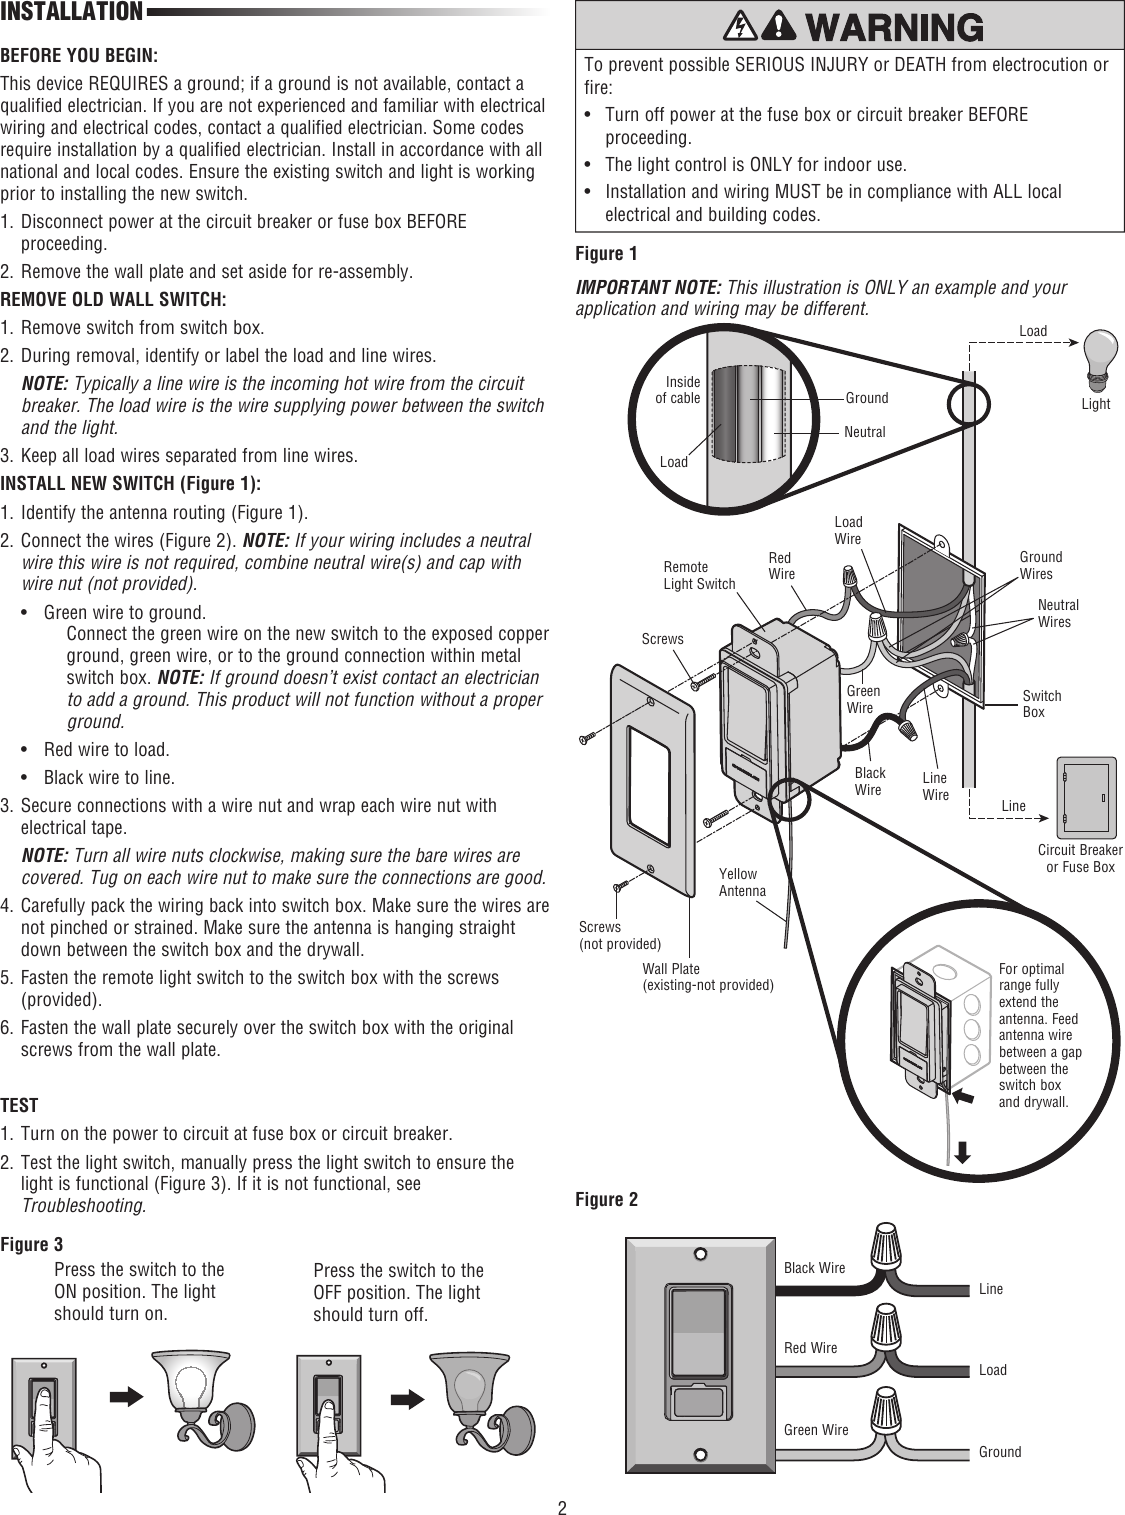 page 2 of 4 - chamberlain chamberlain-wslcev-remote-light-switch-